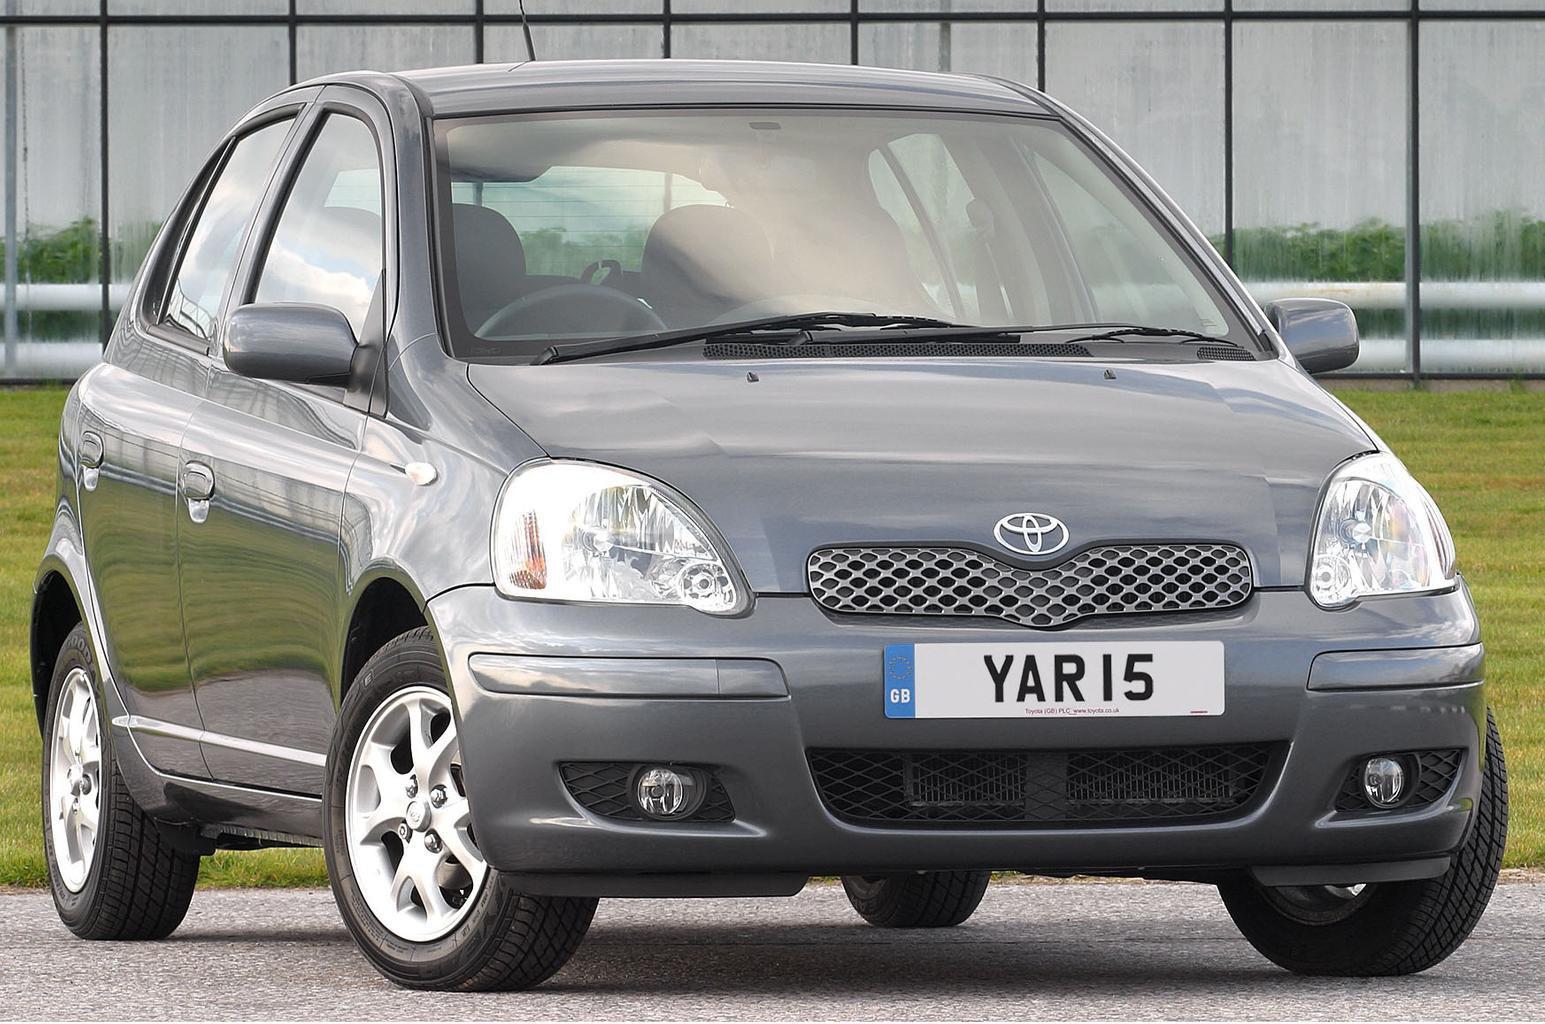 Toyota Yaris Hatchback (03 - 05)